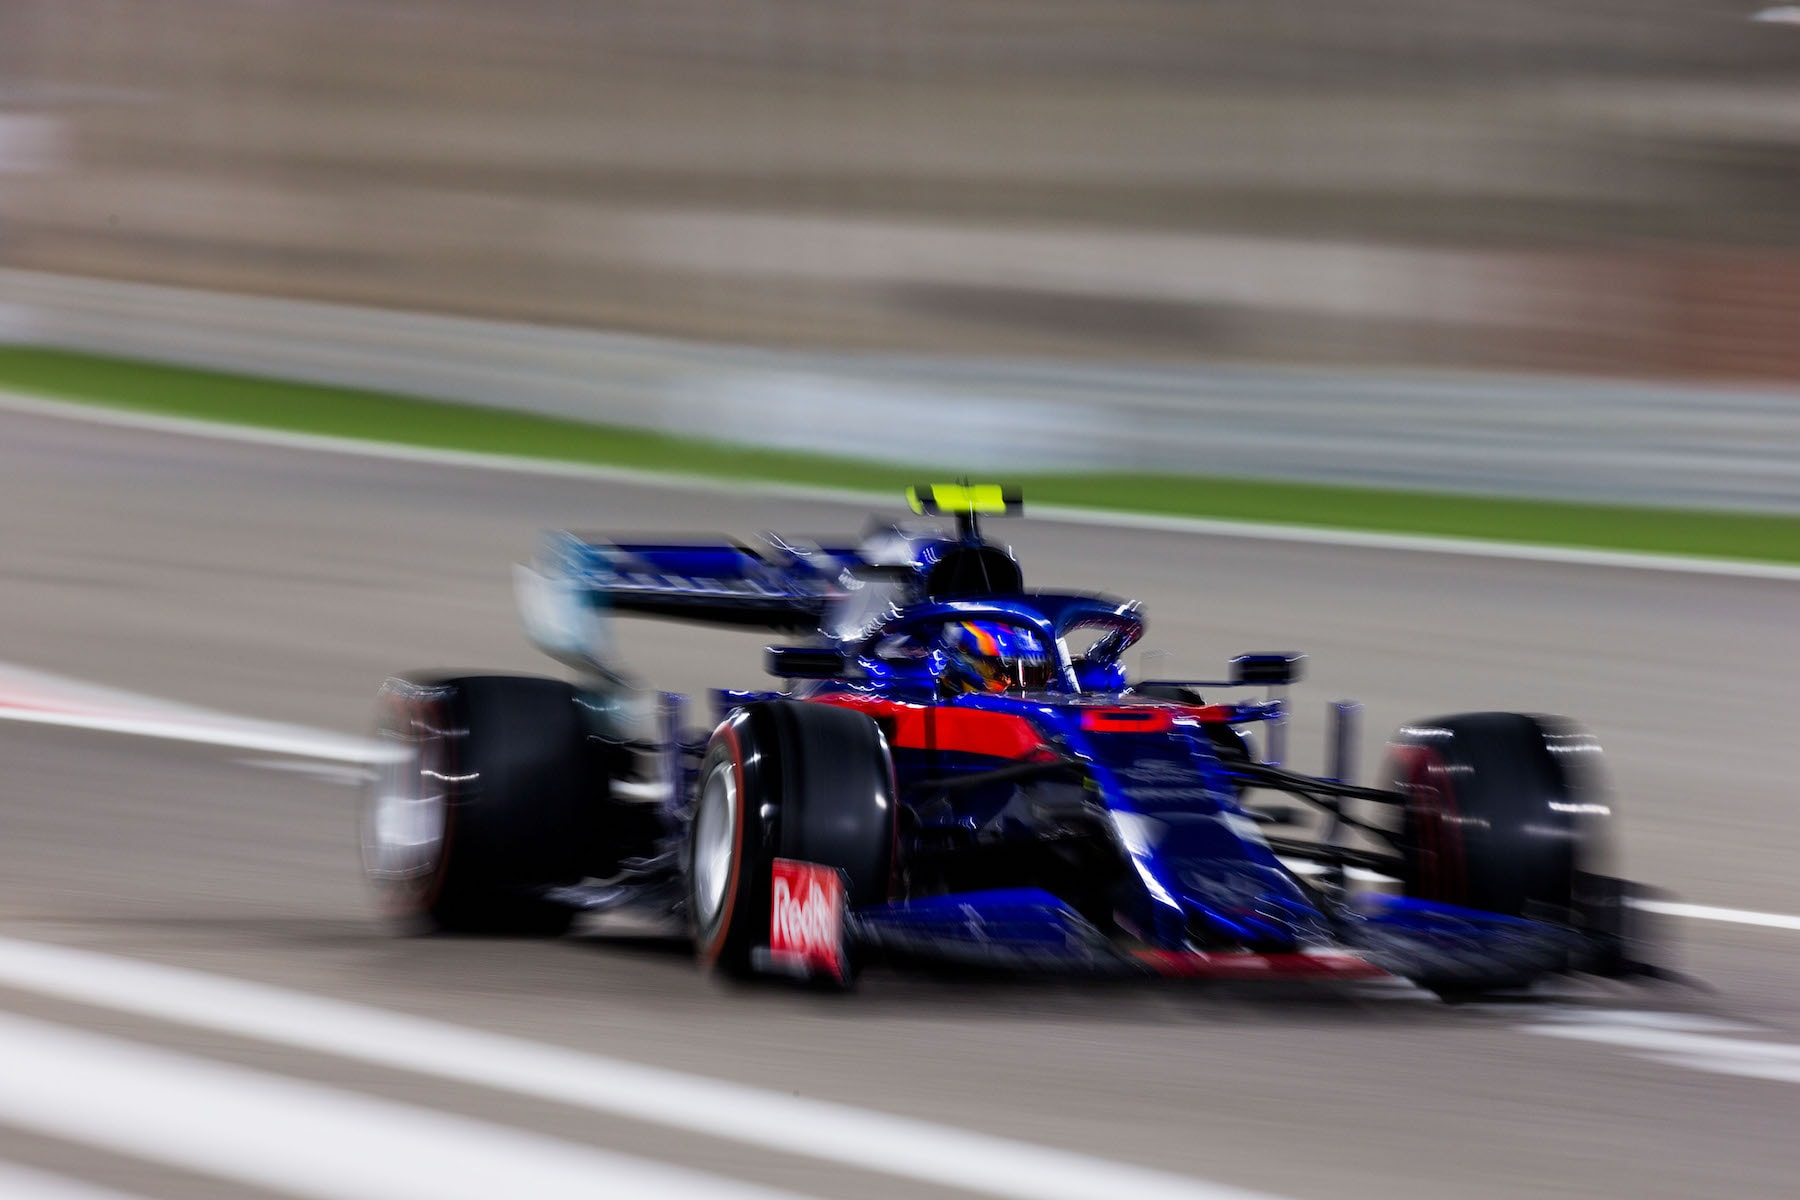 2 1 2 2019 Alex Albon | Toro Rosso STR14 | 2019 Bahrain GP 1 copy.jpg